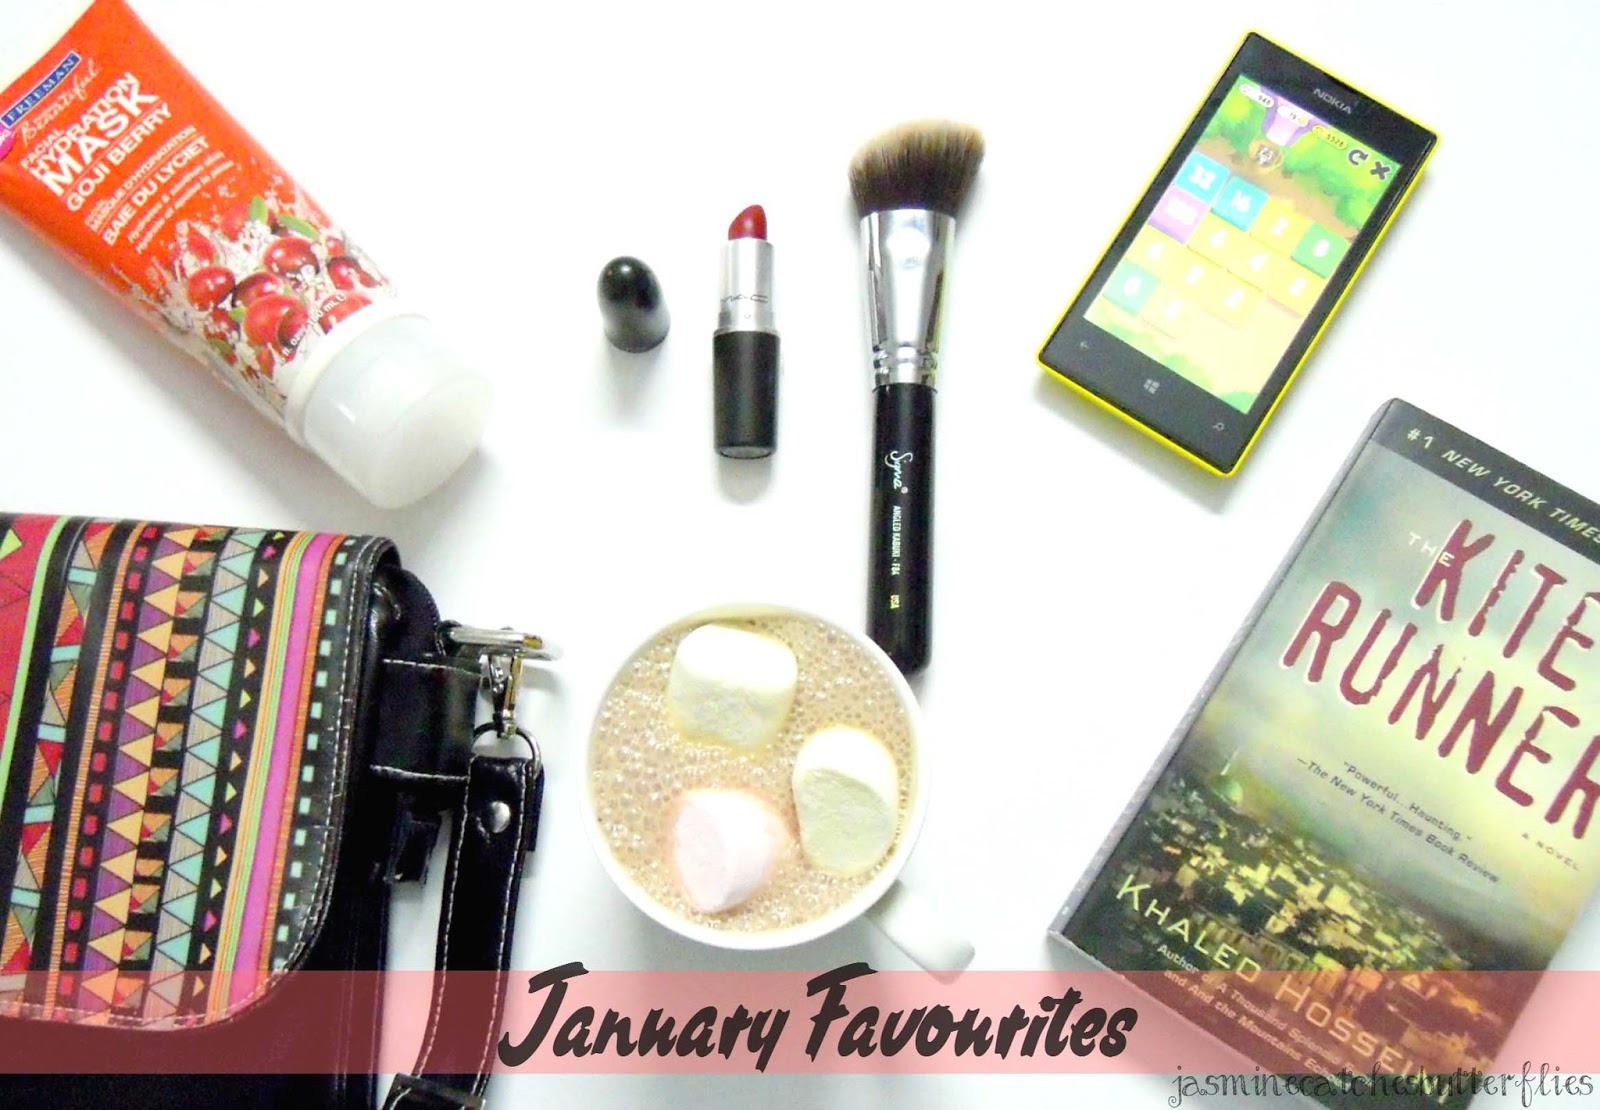 January Favourites 2015